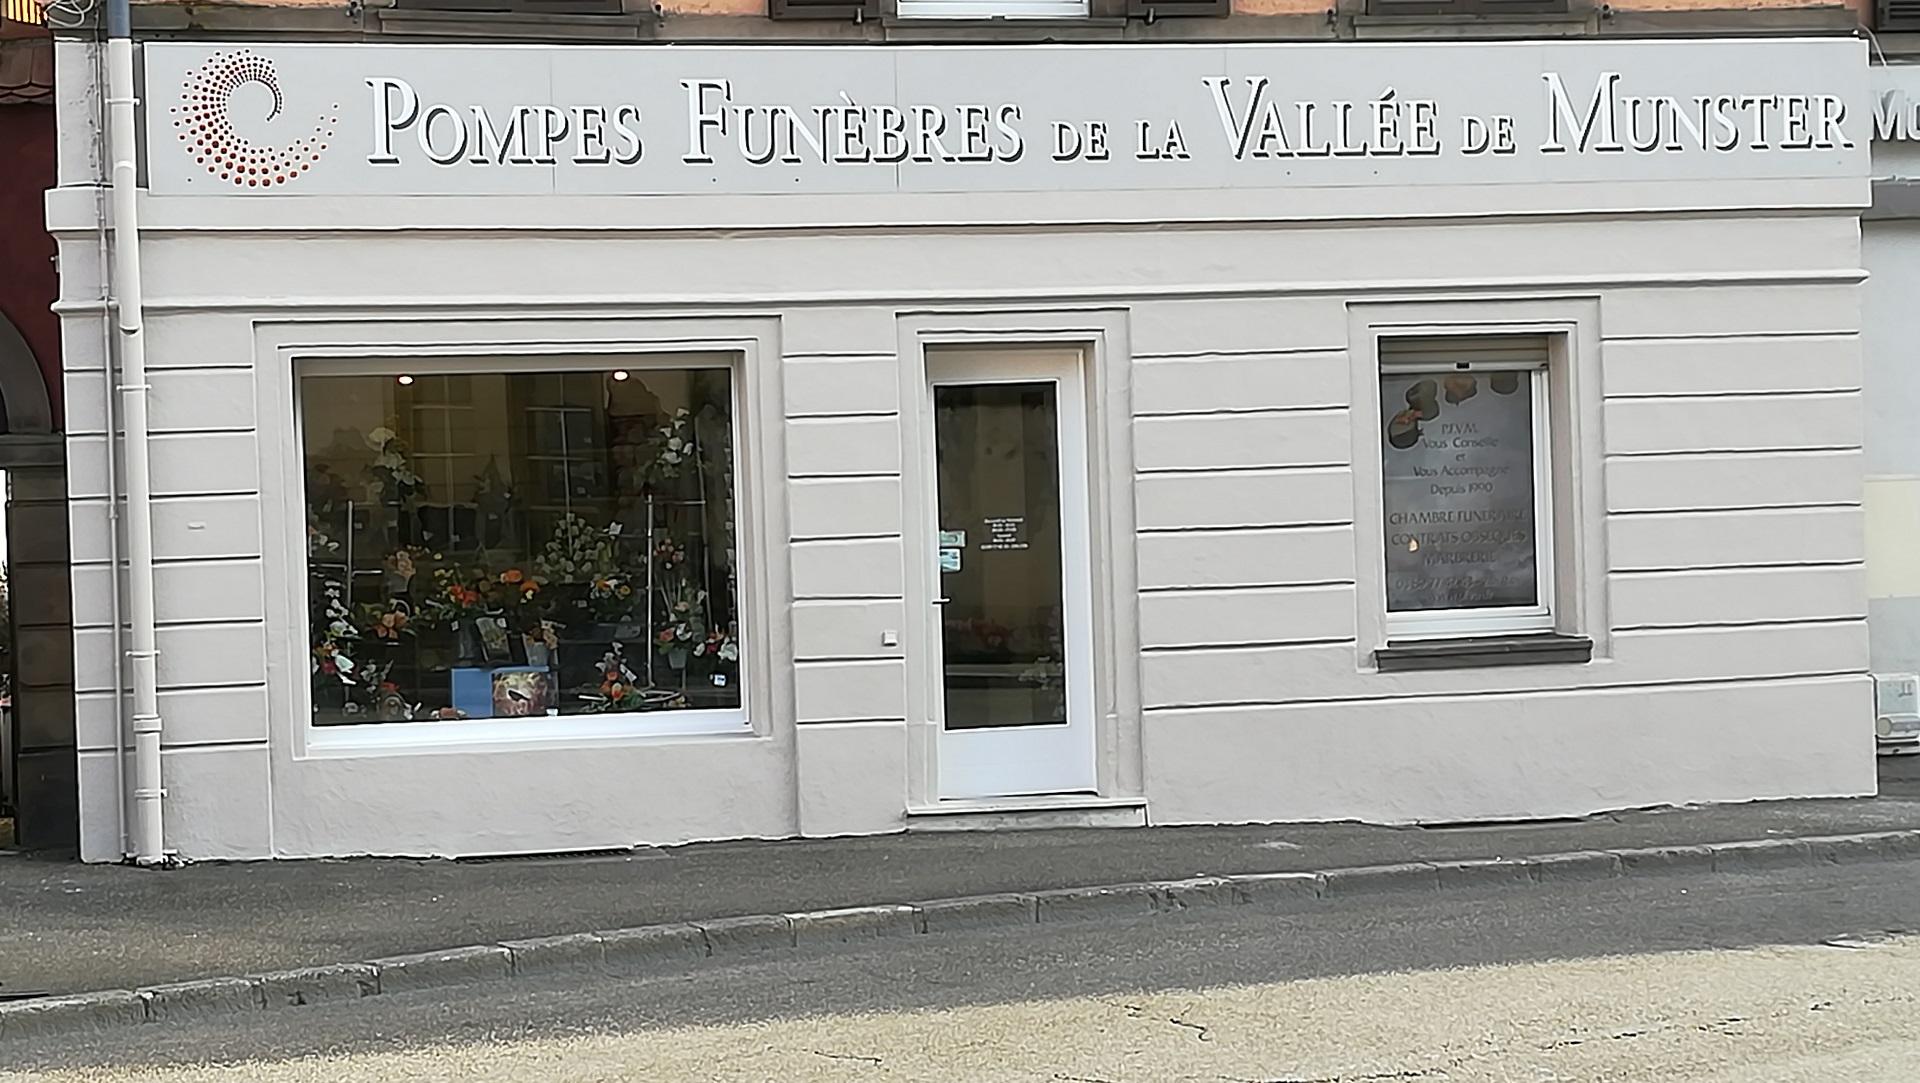 Façade de l'agence de la Vallée de Munster